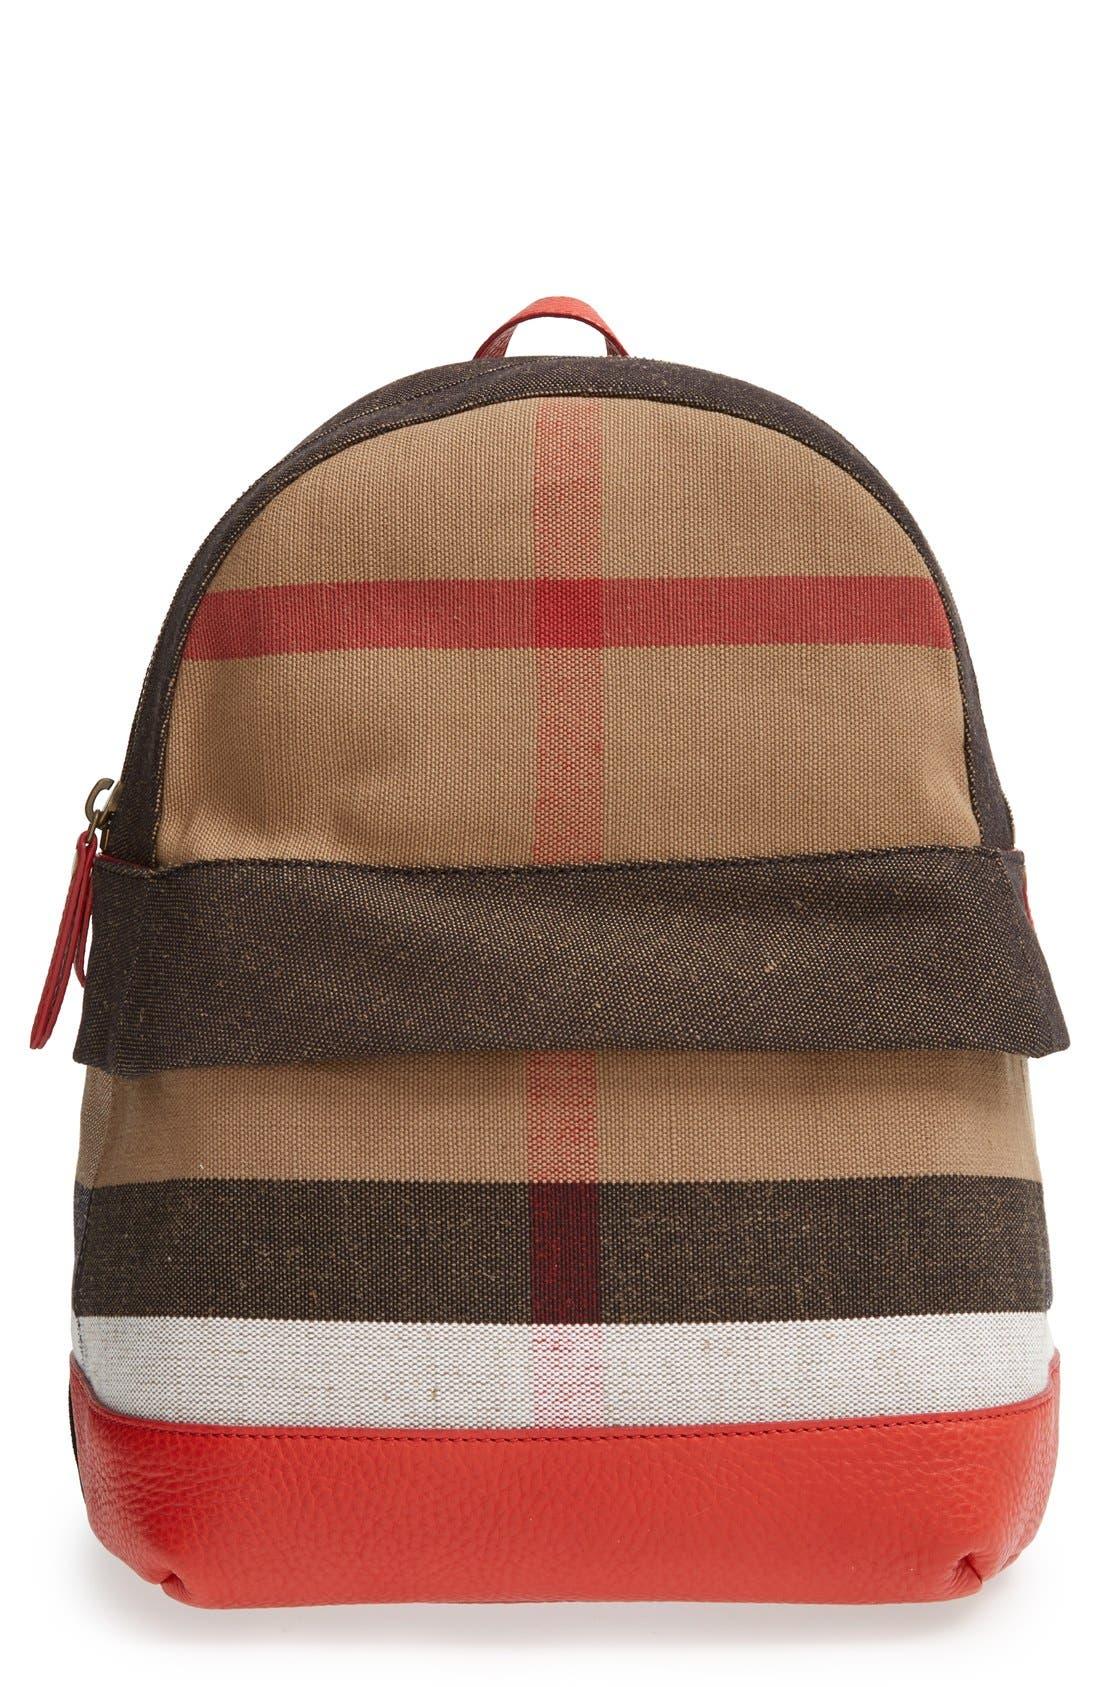 Main Image - Burberry 'Tiller Check' Backpack